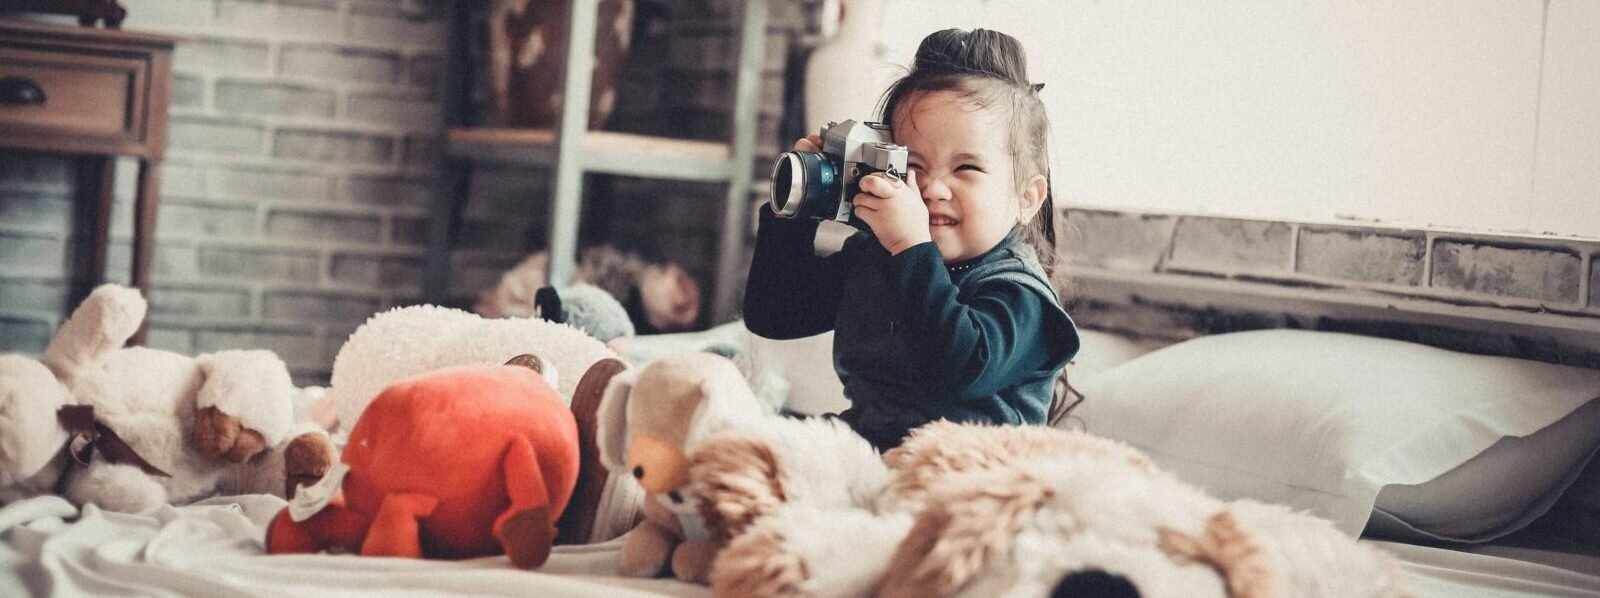 adorable-asian-children-bed-860538-e1529938620249-1600x598.jpg